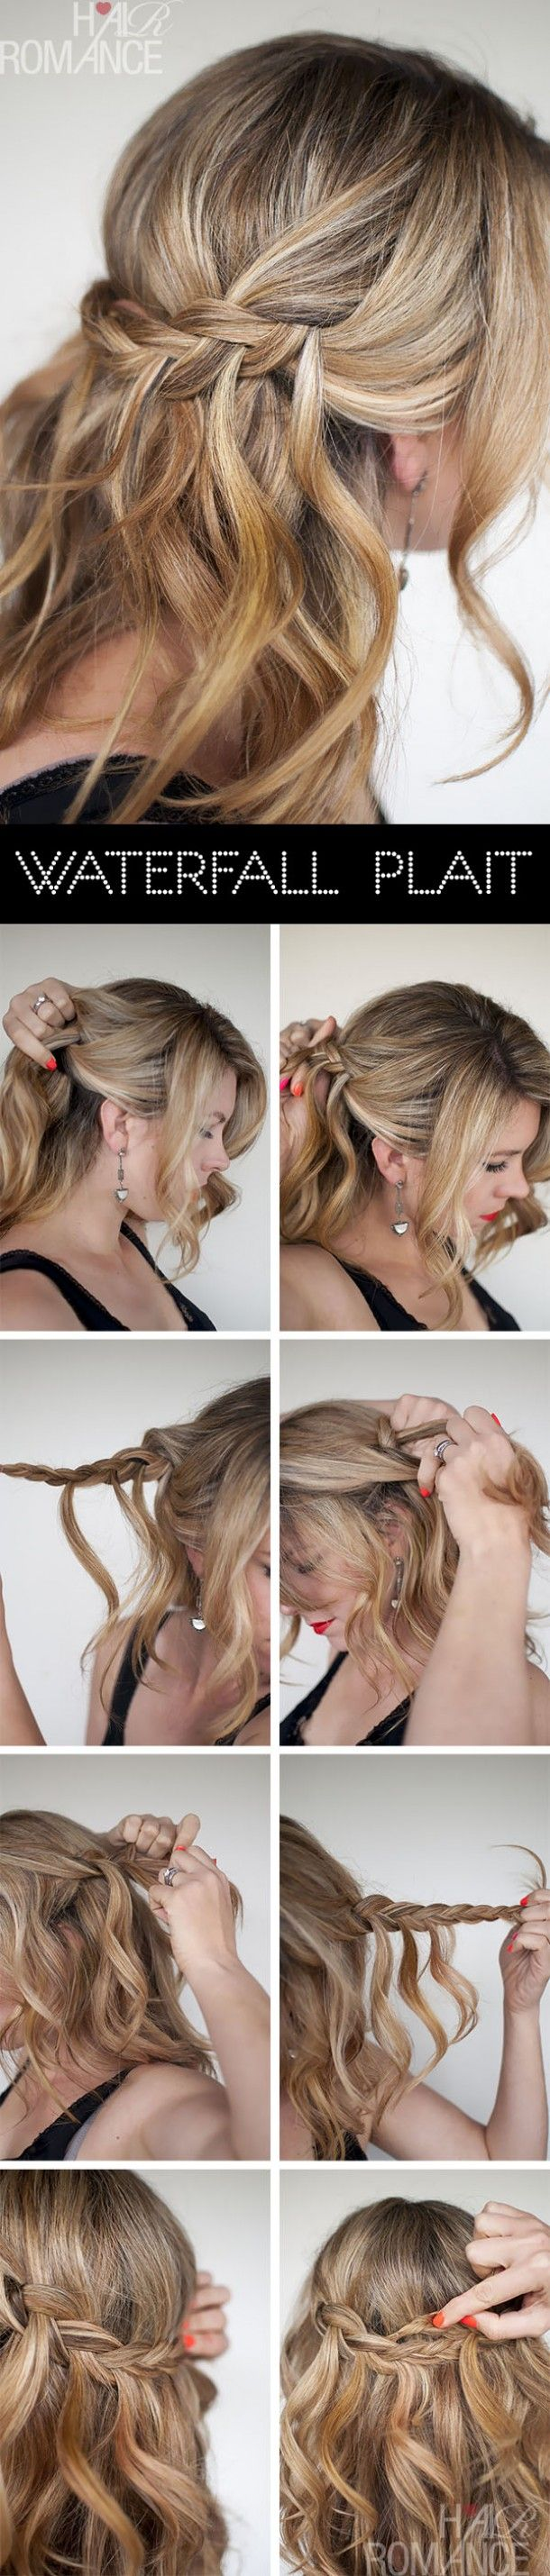 waterfall plait hairstyle Door Gwenny159